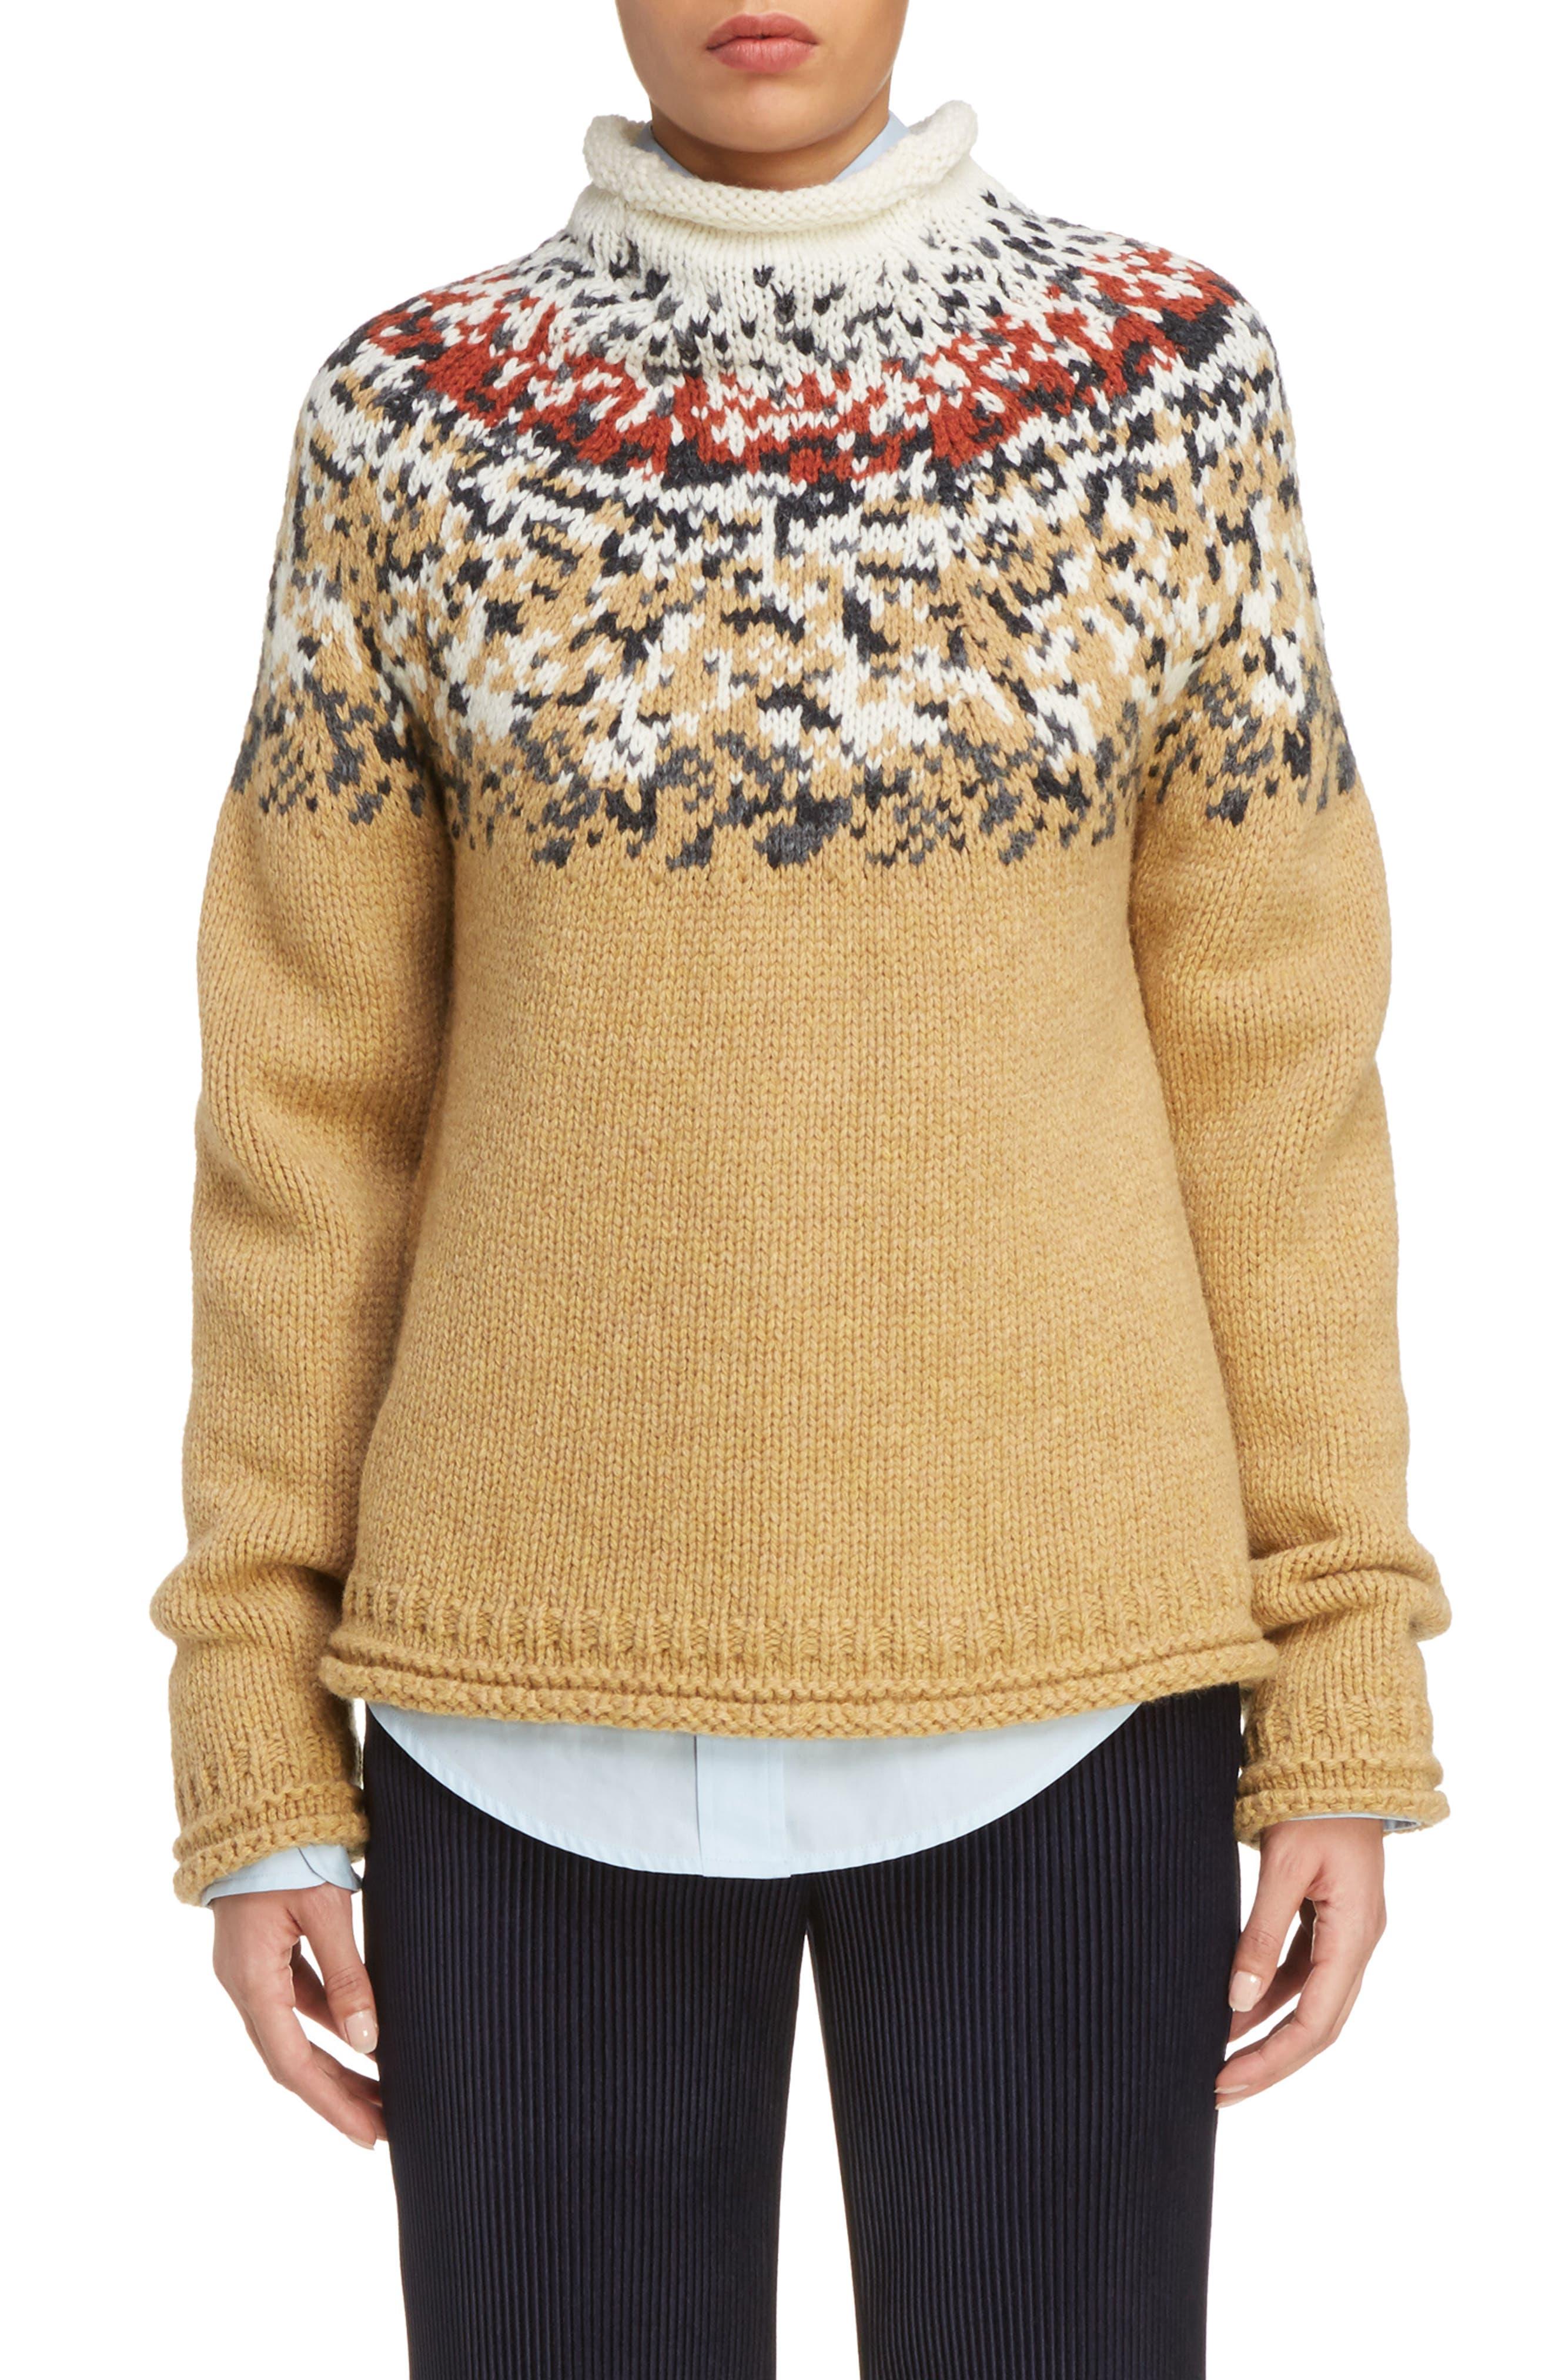 Alternate Image 1 Selected - ACNE Studios Sirius Heavy Icelandic High Neck Sweater